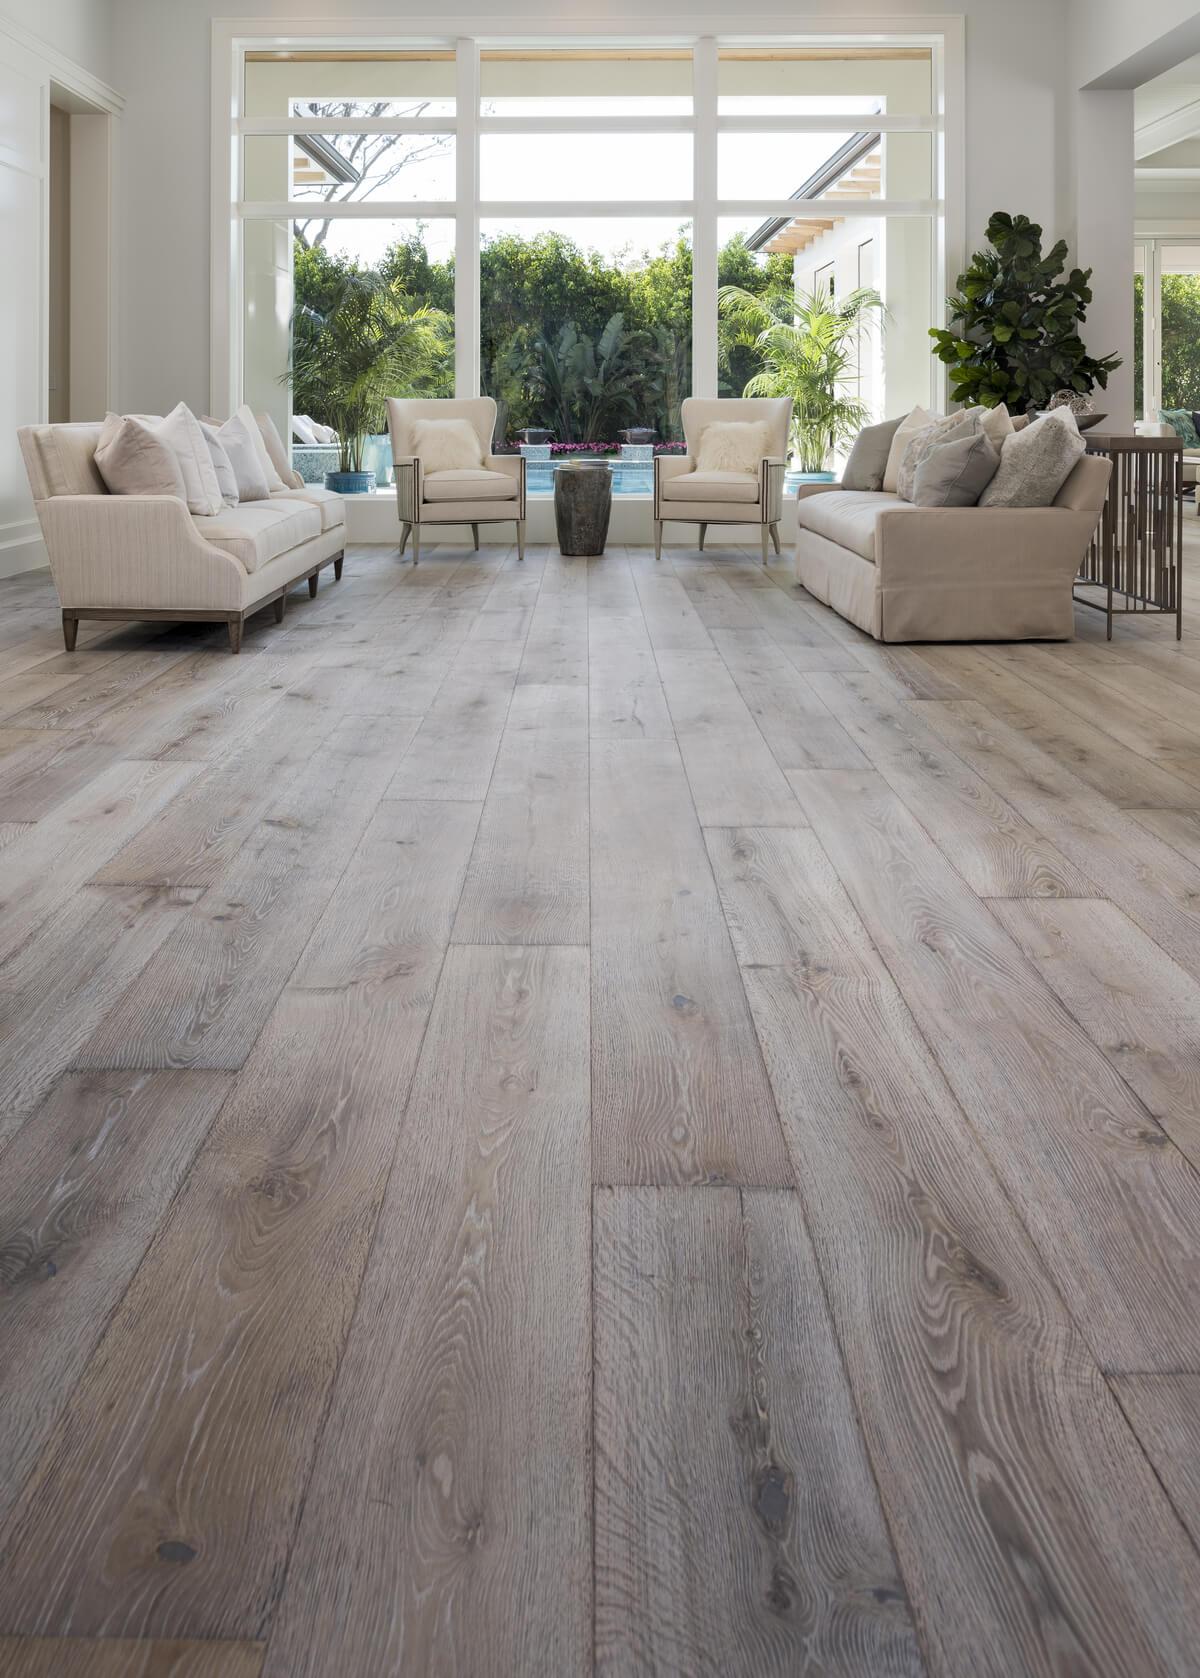 Legno Bastone hardwood flooring feature